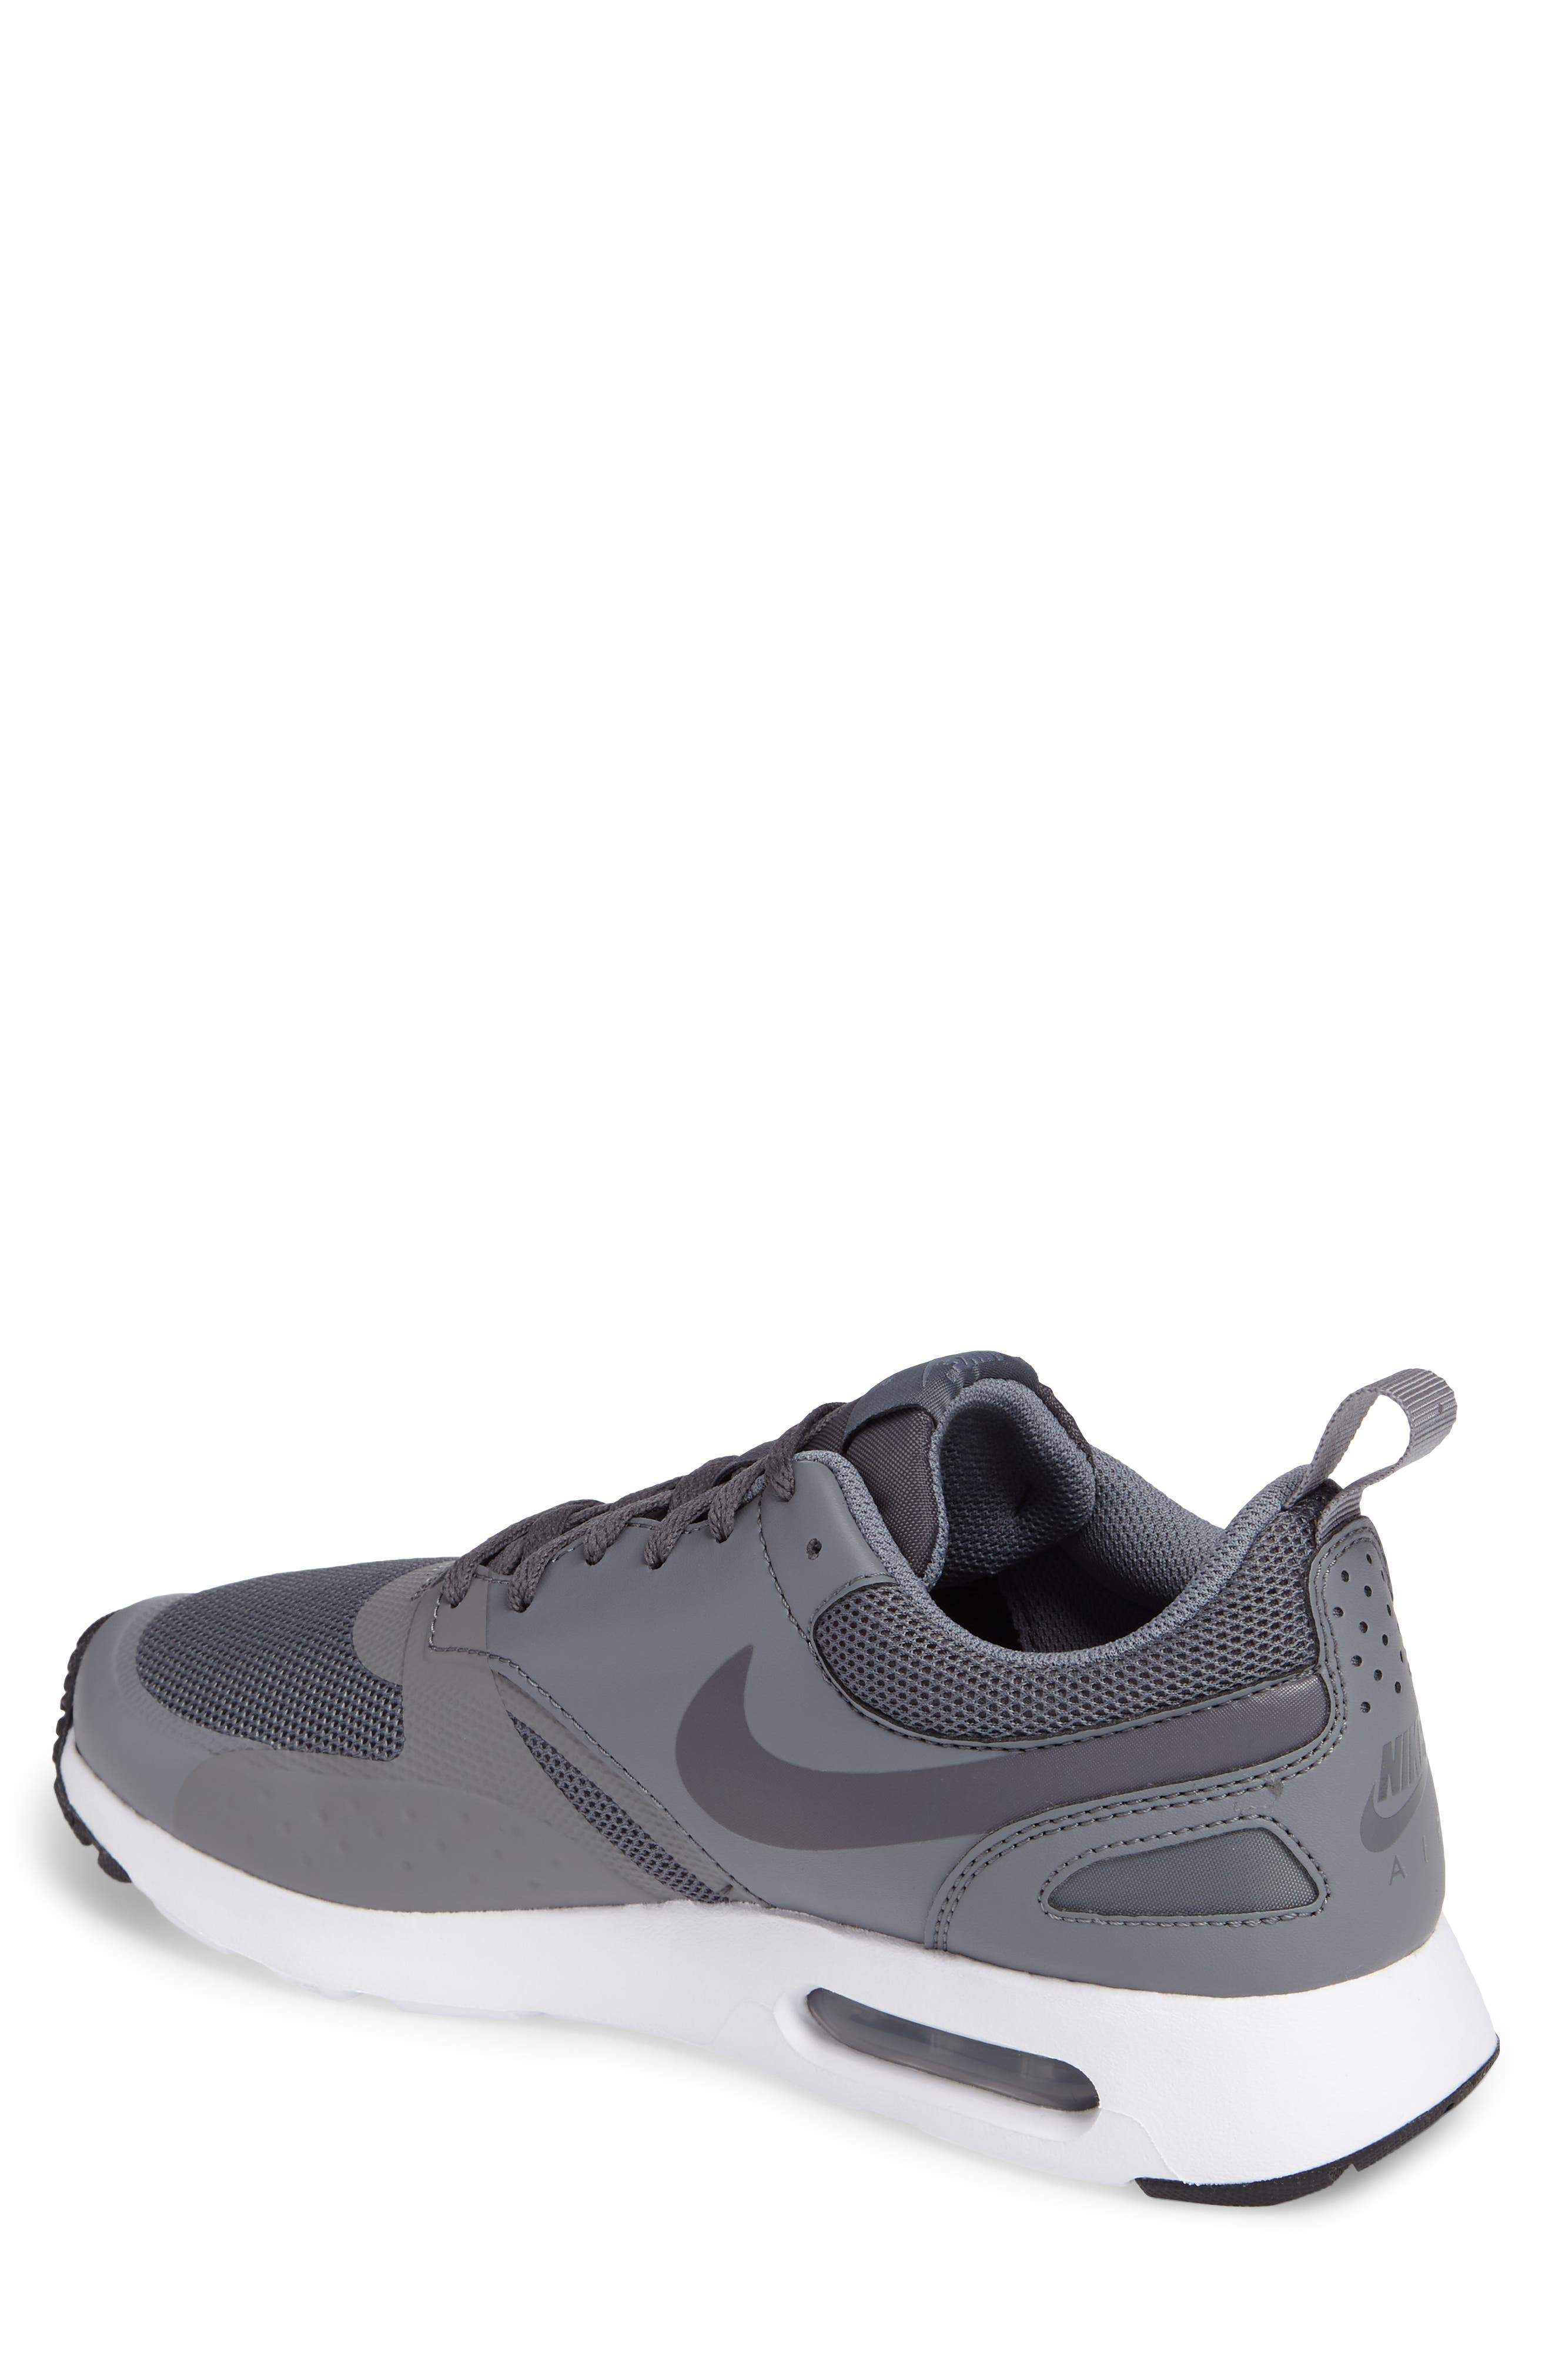 Air Max Vision Sneaker,                             Alternate thumbnail 2, color,                             Cool Grey/ Dark Grey/ White